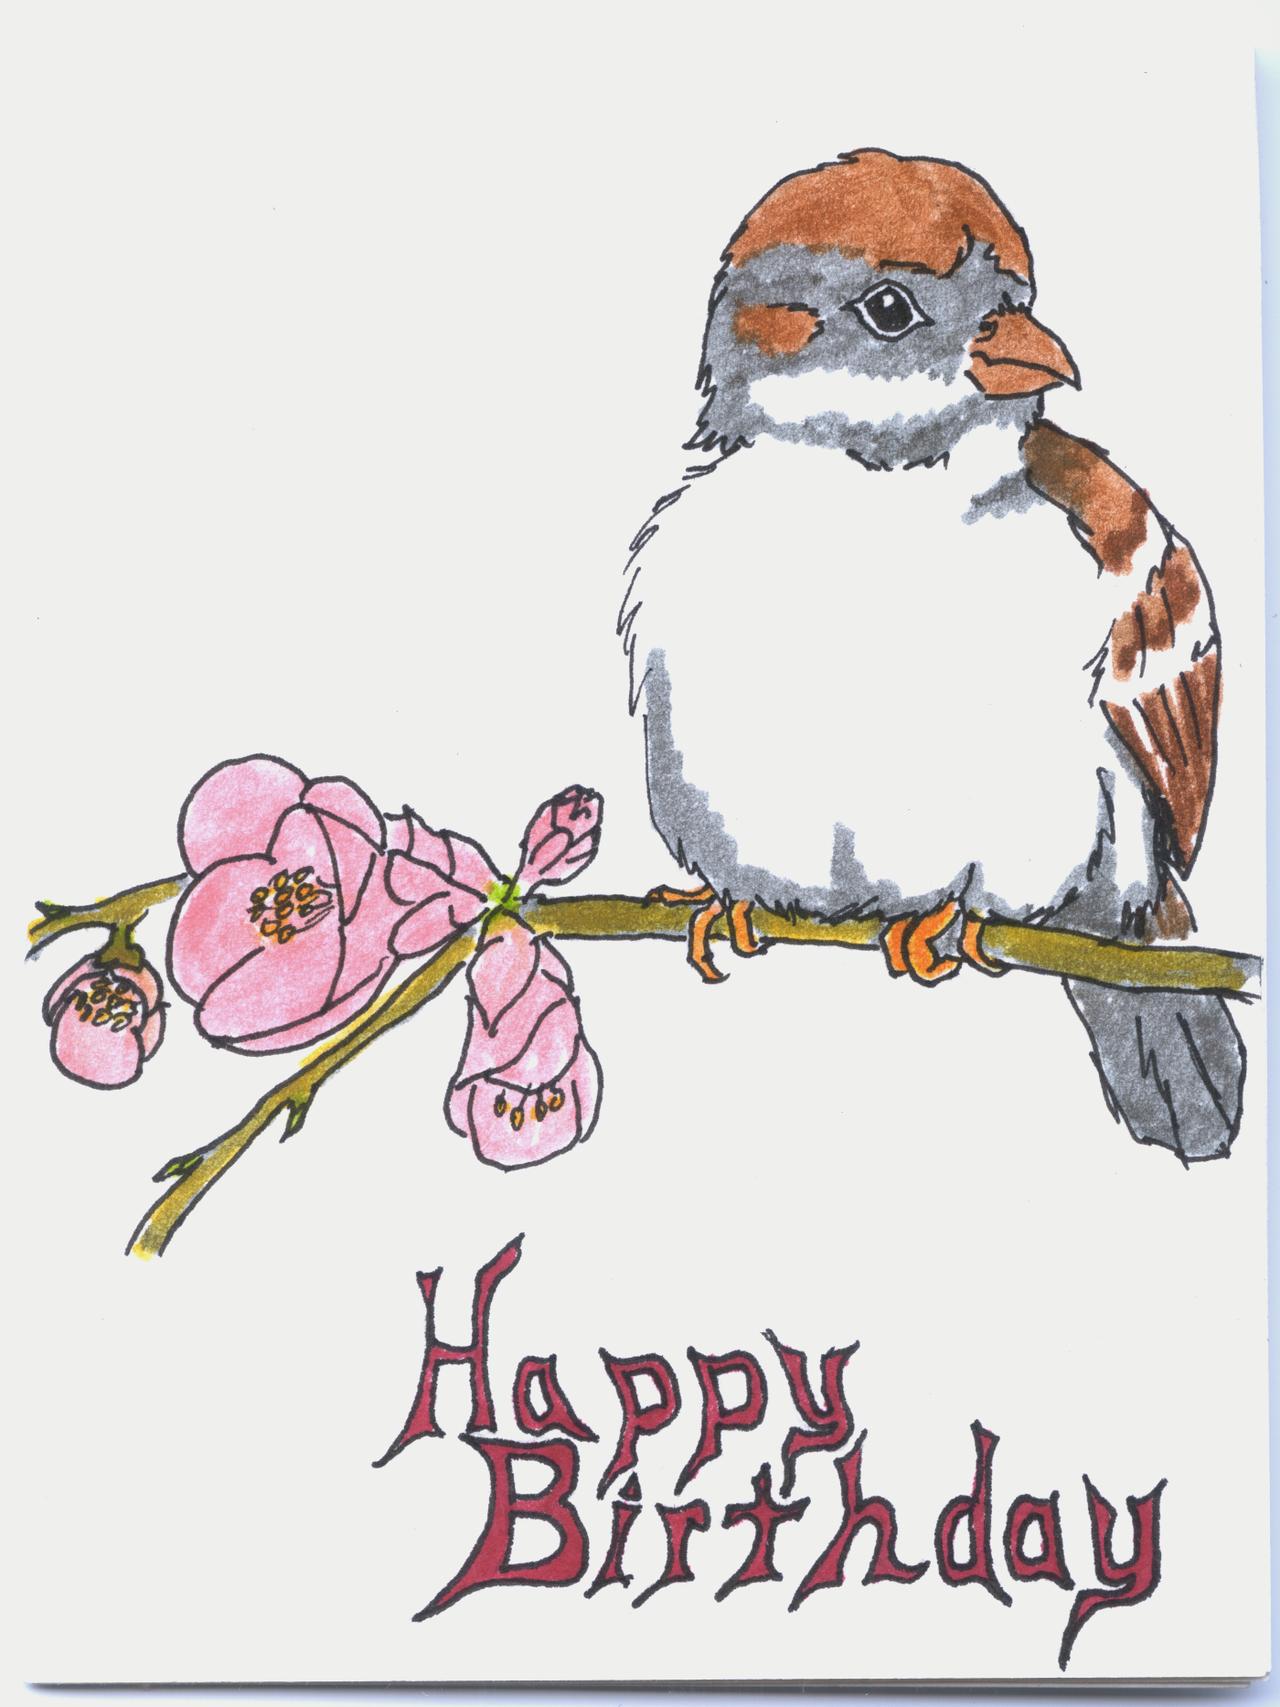 Grandmas birthday card by TelegramSam on DeviantArt – Birthday Cards for Grandmas